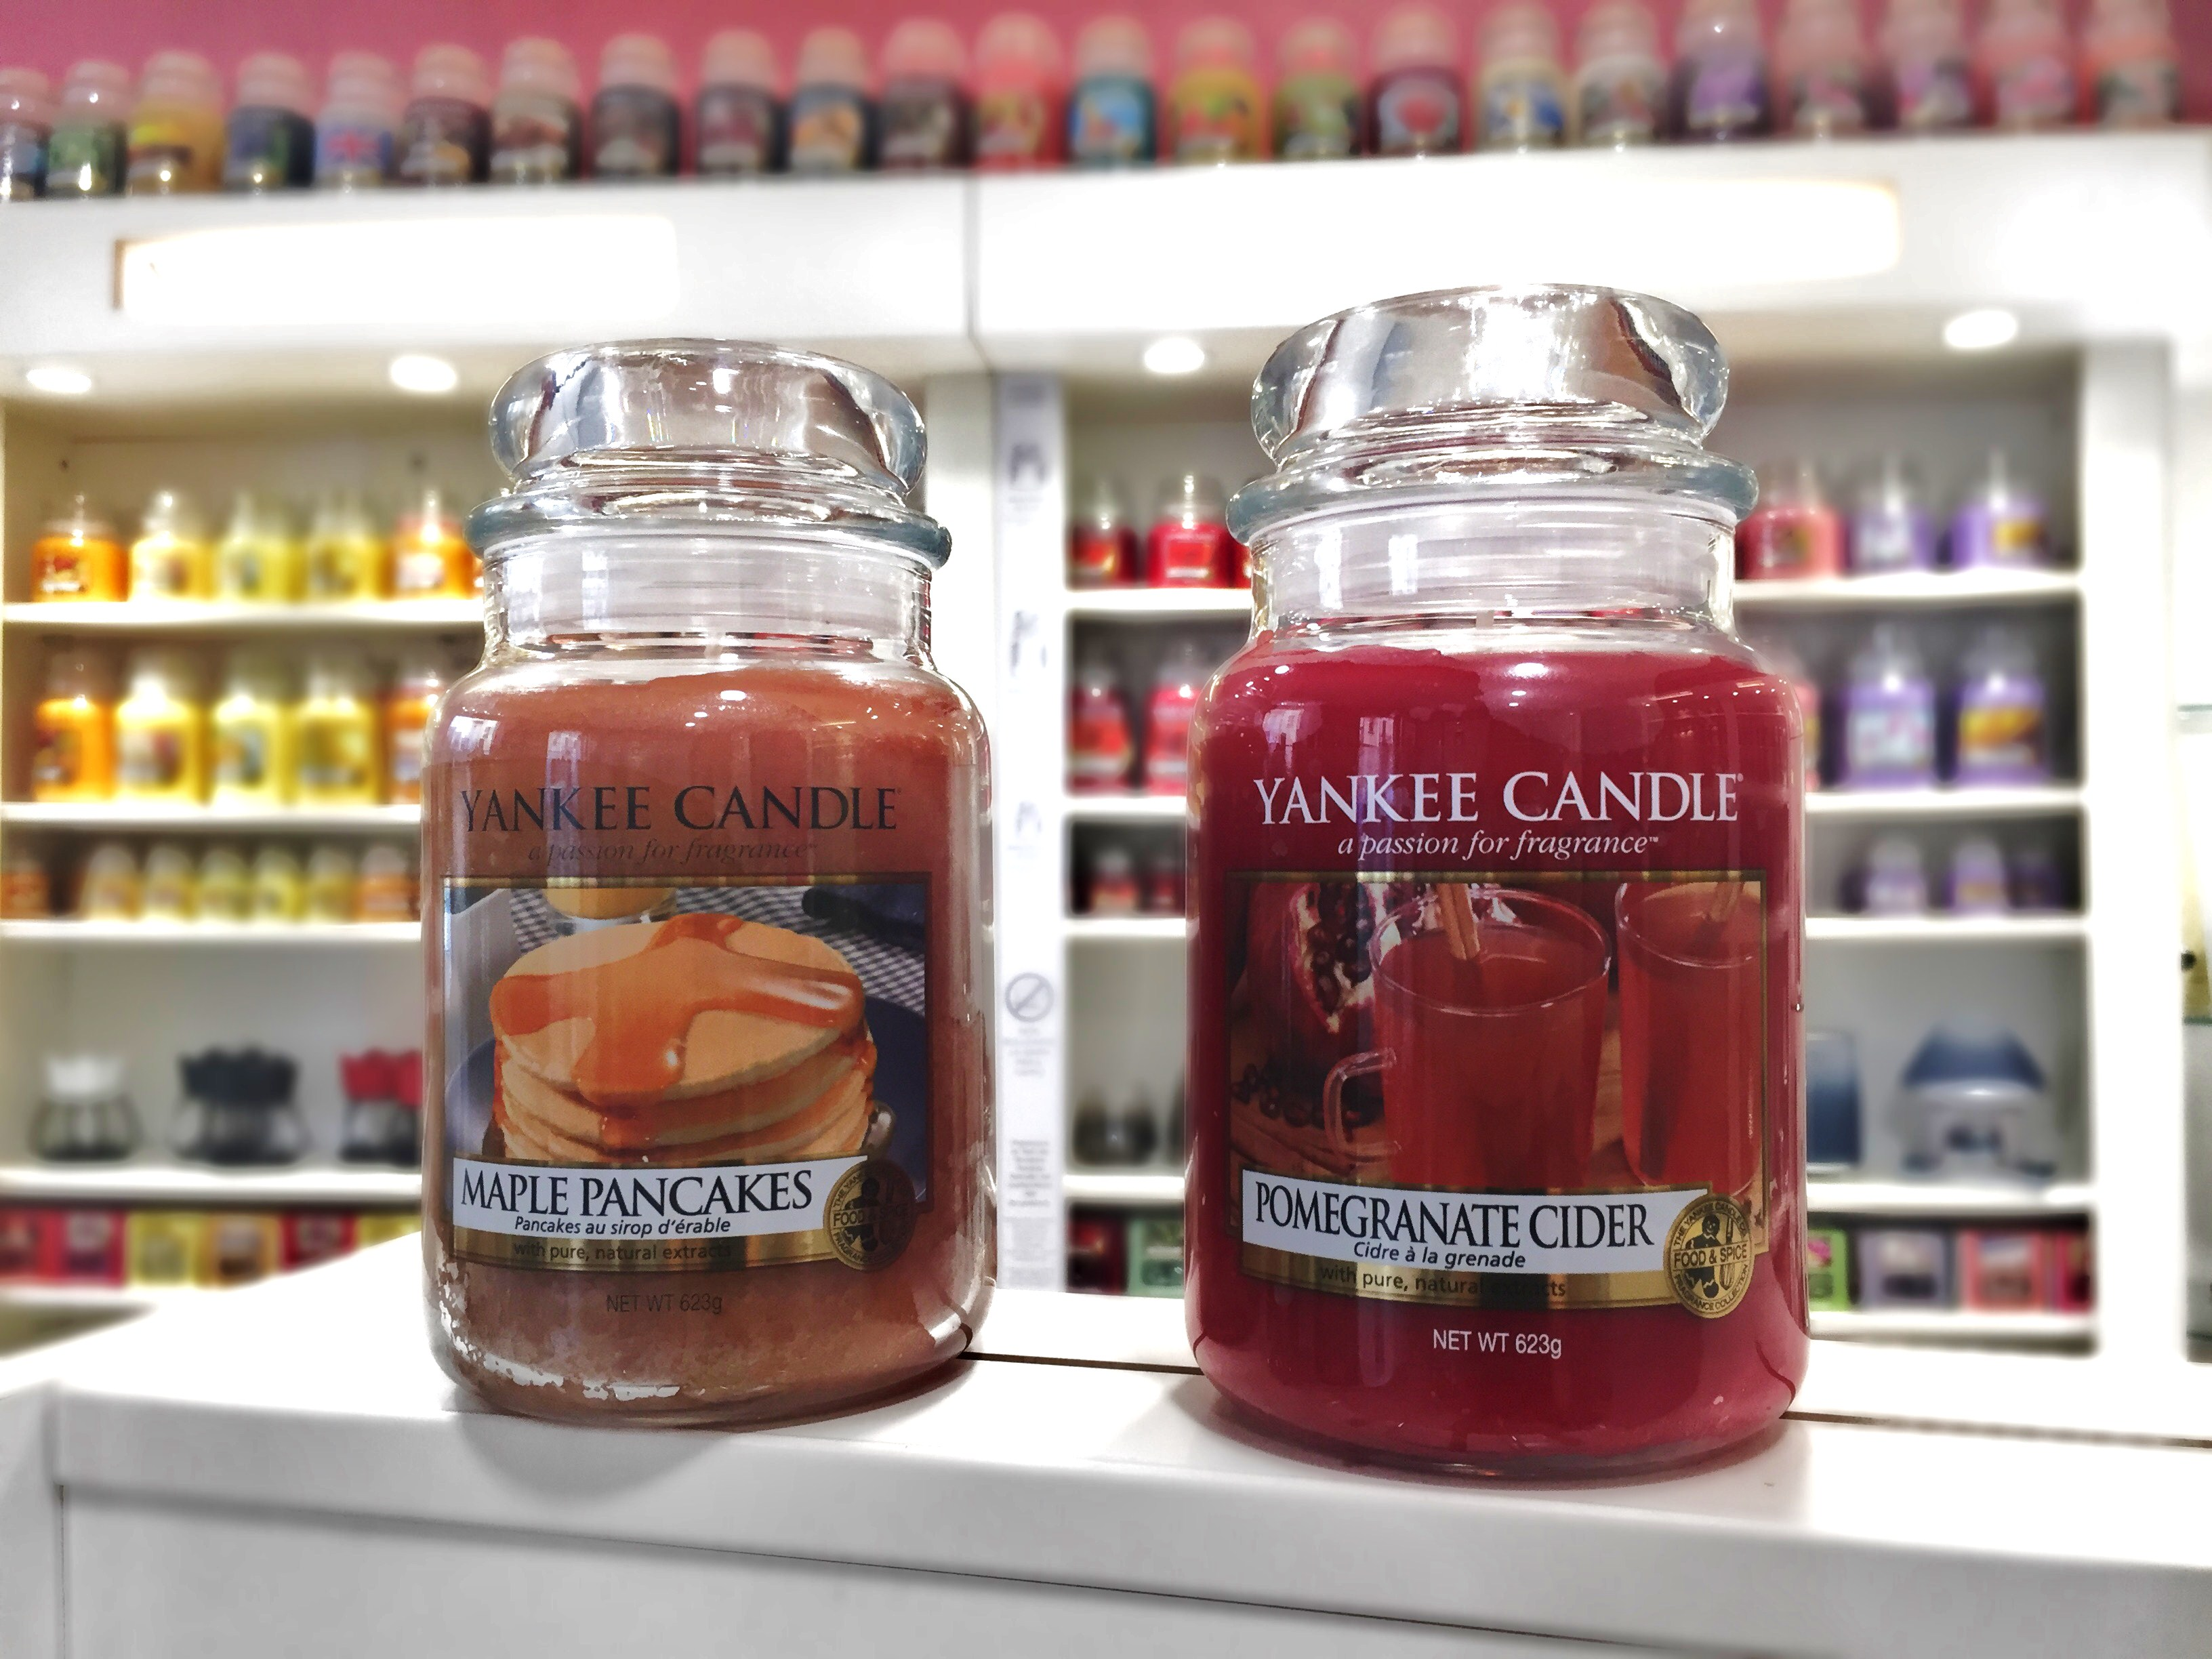 Yankee Candle Torino.Lucrezia Scali Yankee Candle Collezione Autunnale Ma In